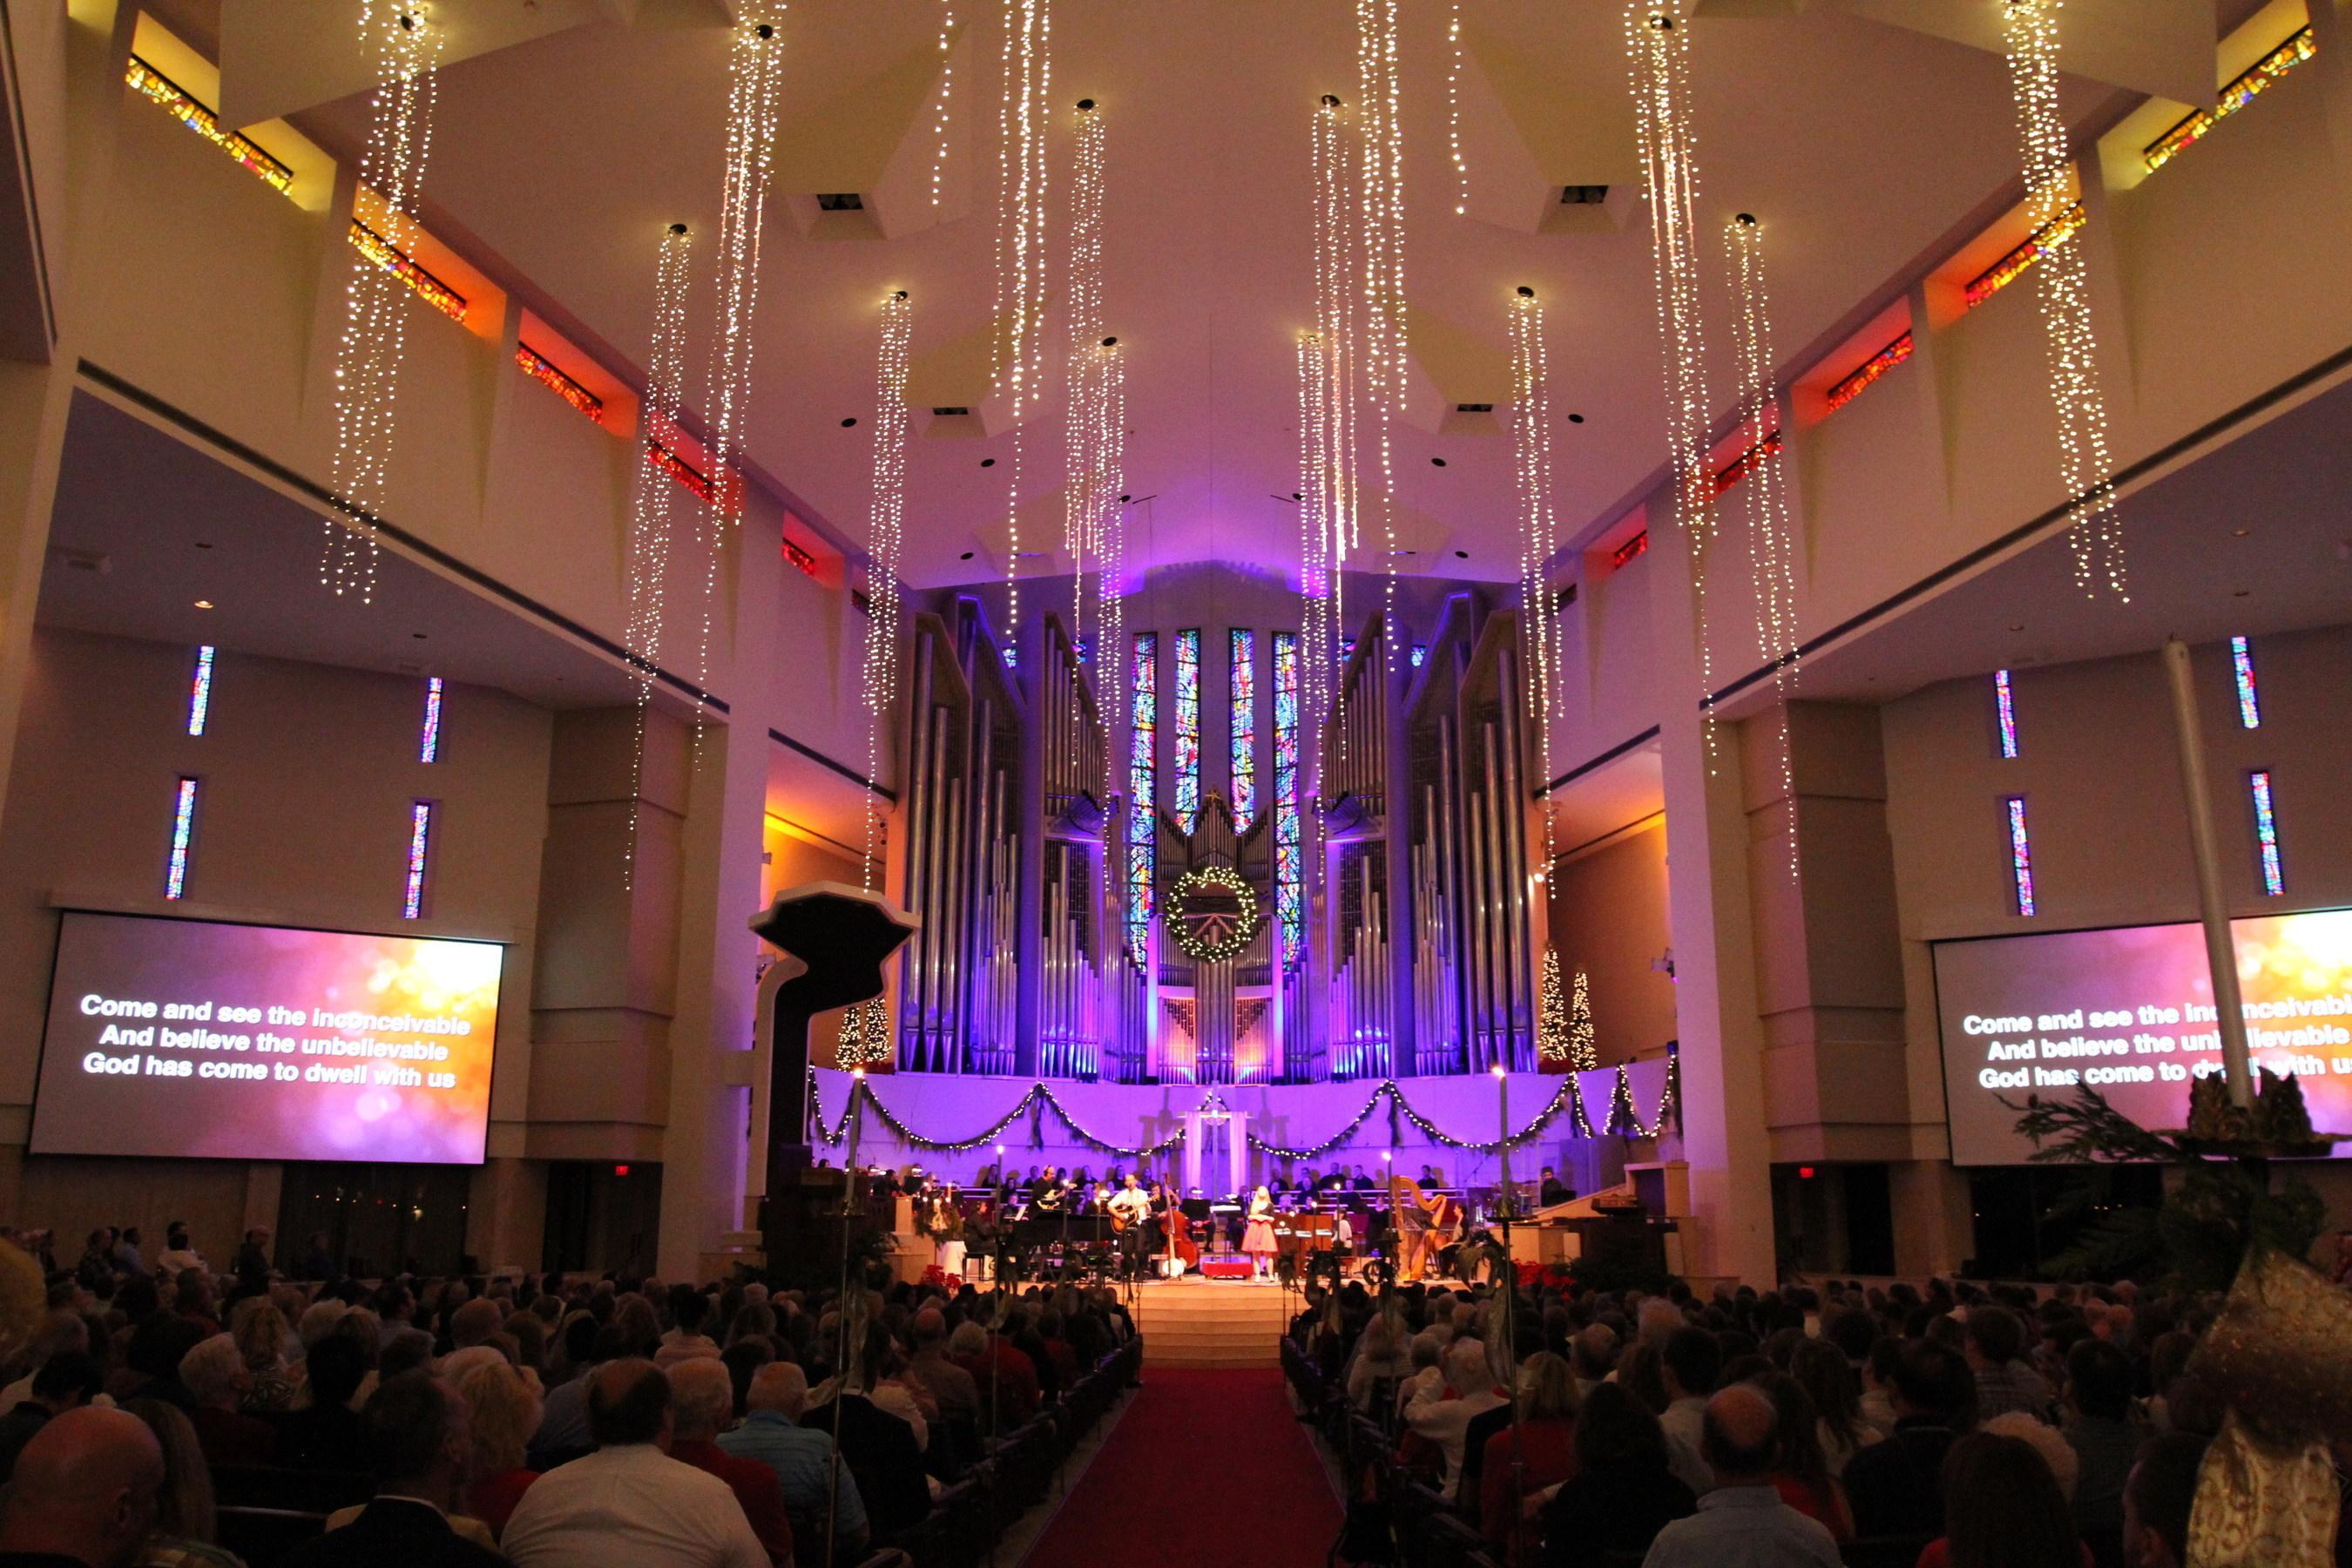 celebrate the christmas season at coral ridge presbyterian church